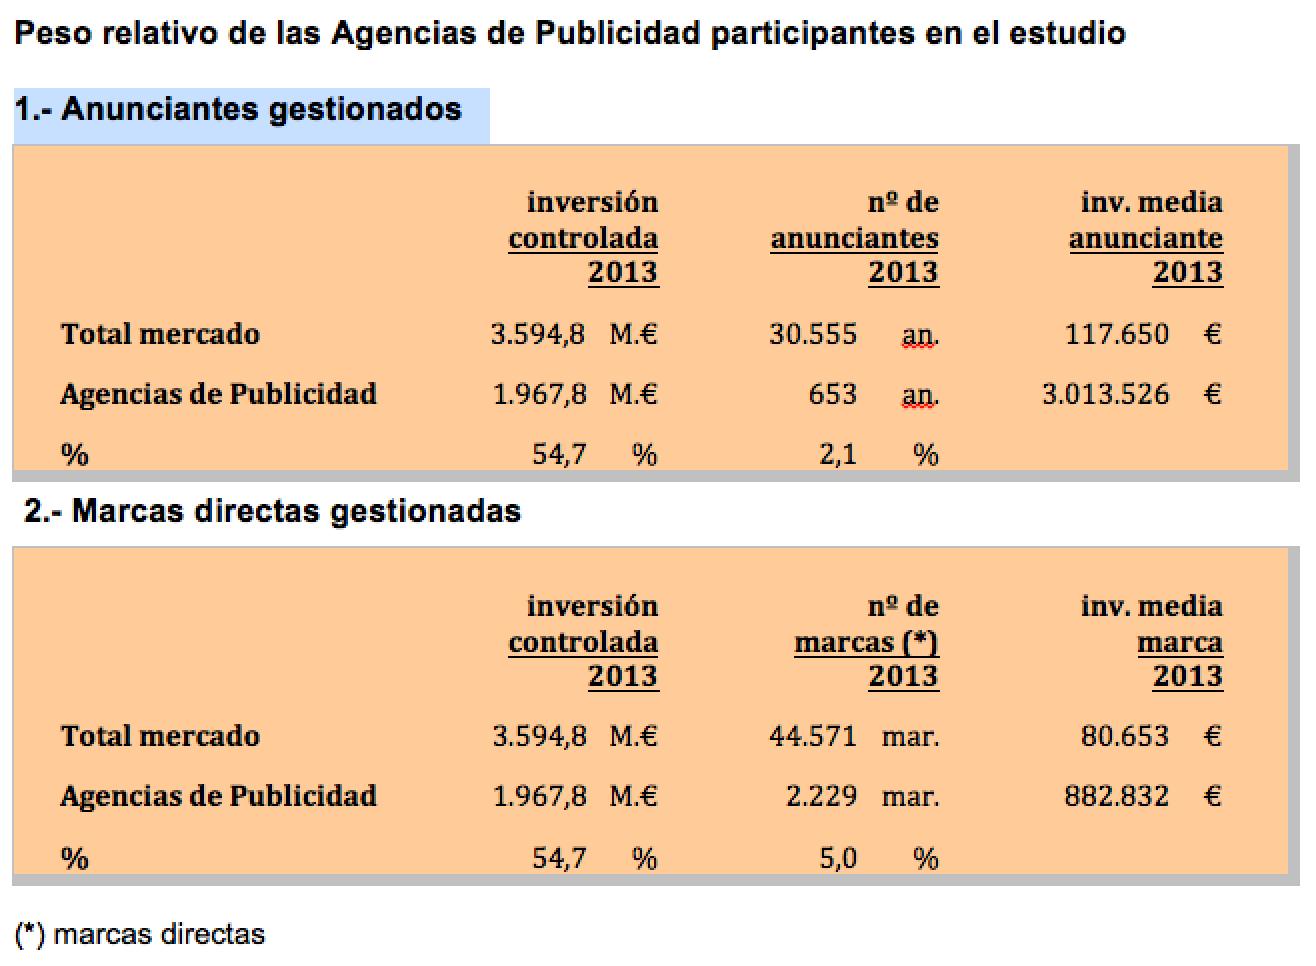 inversion_gestionada